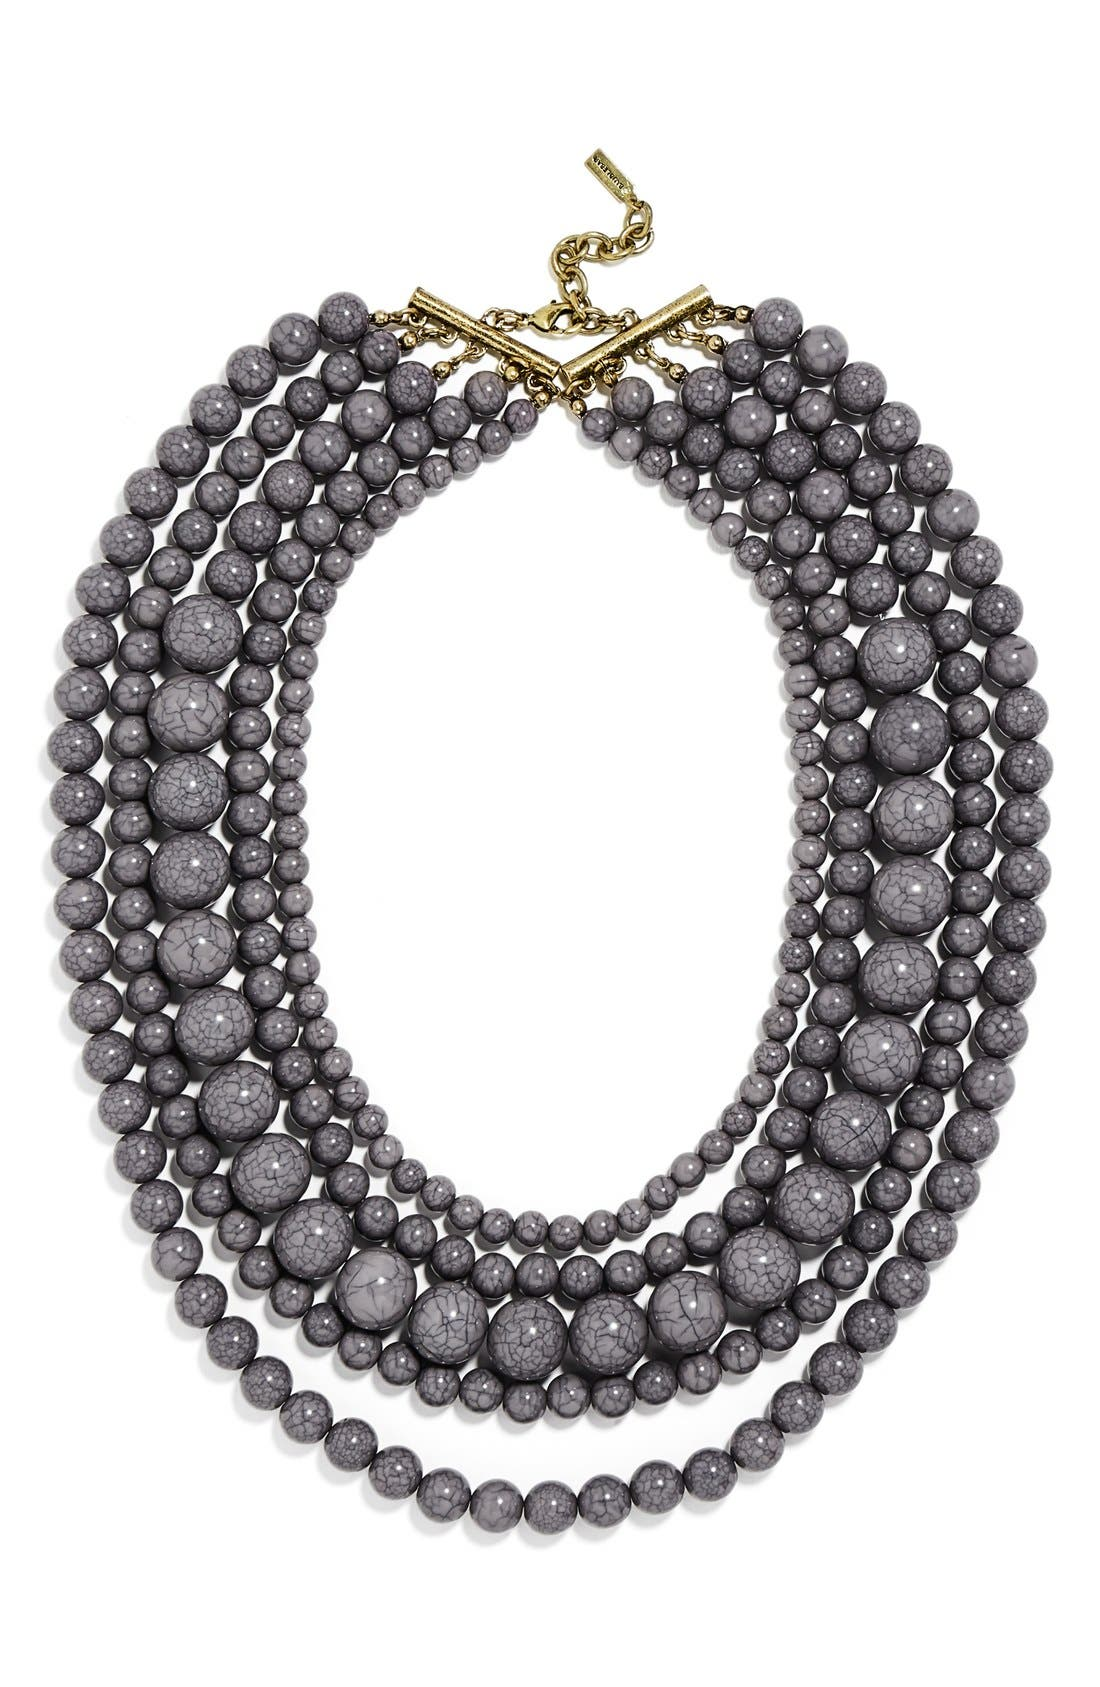 'Globe' Multistrand Beaded Necklace,                             Main thumbnail 1, color,                             021